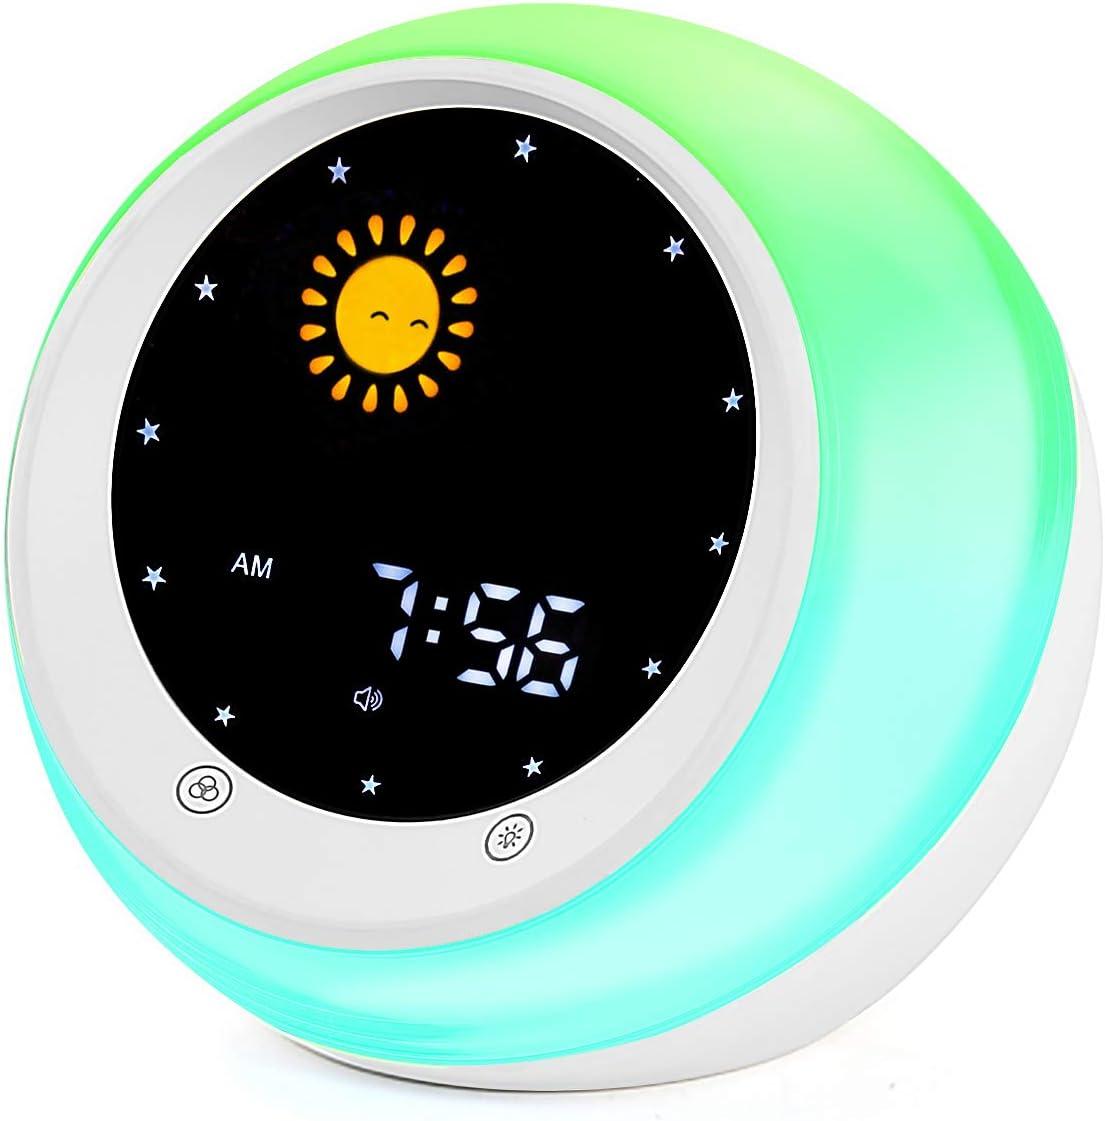 Sun & Moon Rise Kids Alarm Clock, Children's Sleep Trainer,Sleep Sound Machine, Wake Up Light & Night Light,Teach Kids Day & Night